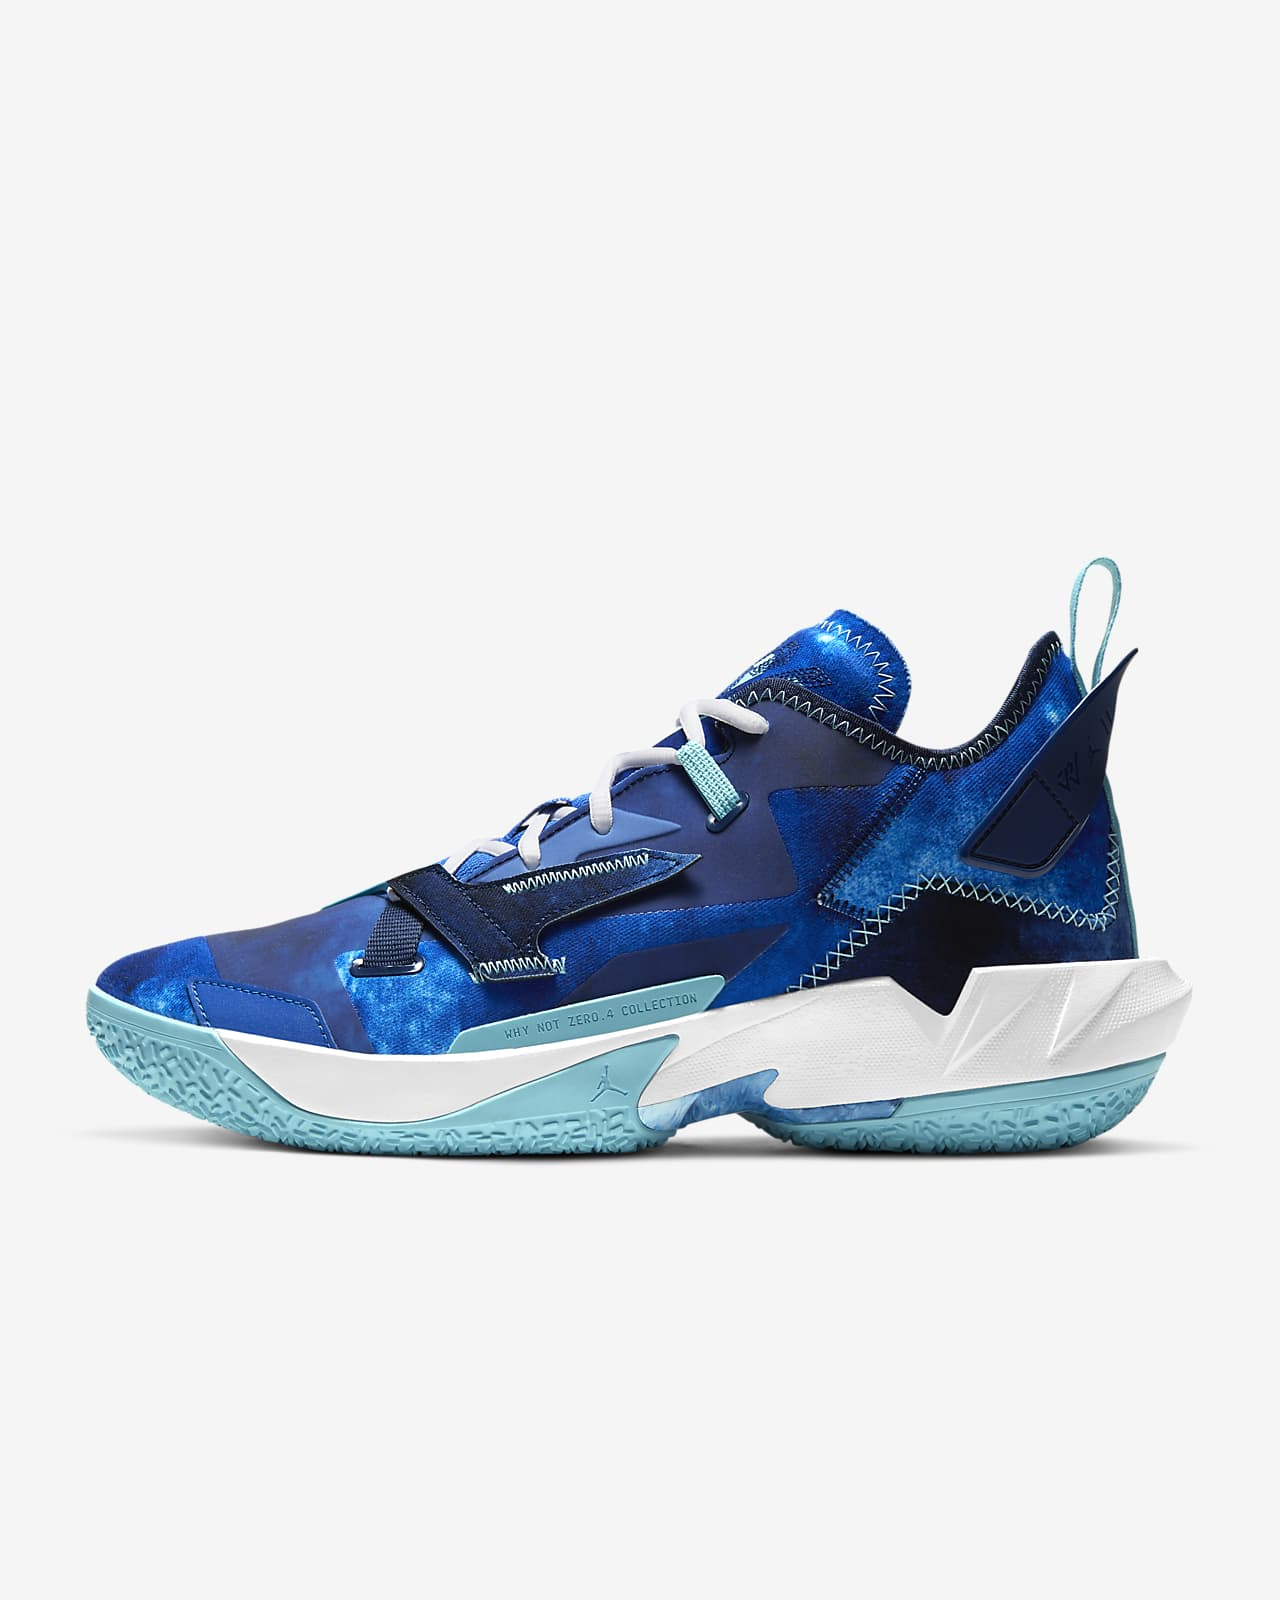 Jordan 'Why Not?'Zer0.4 'Trust & Loyalty' Basketball Shoe